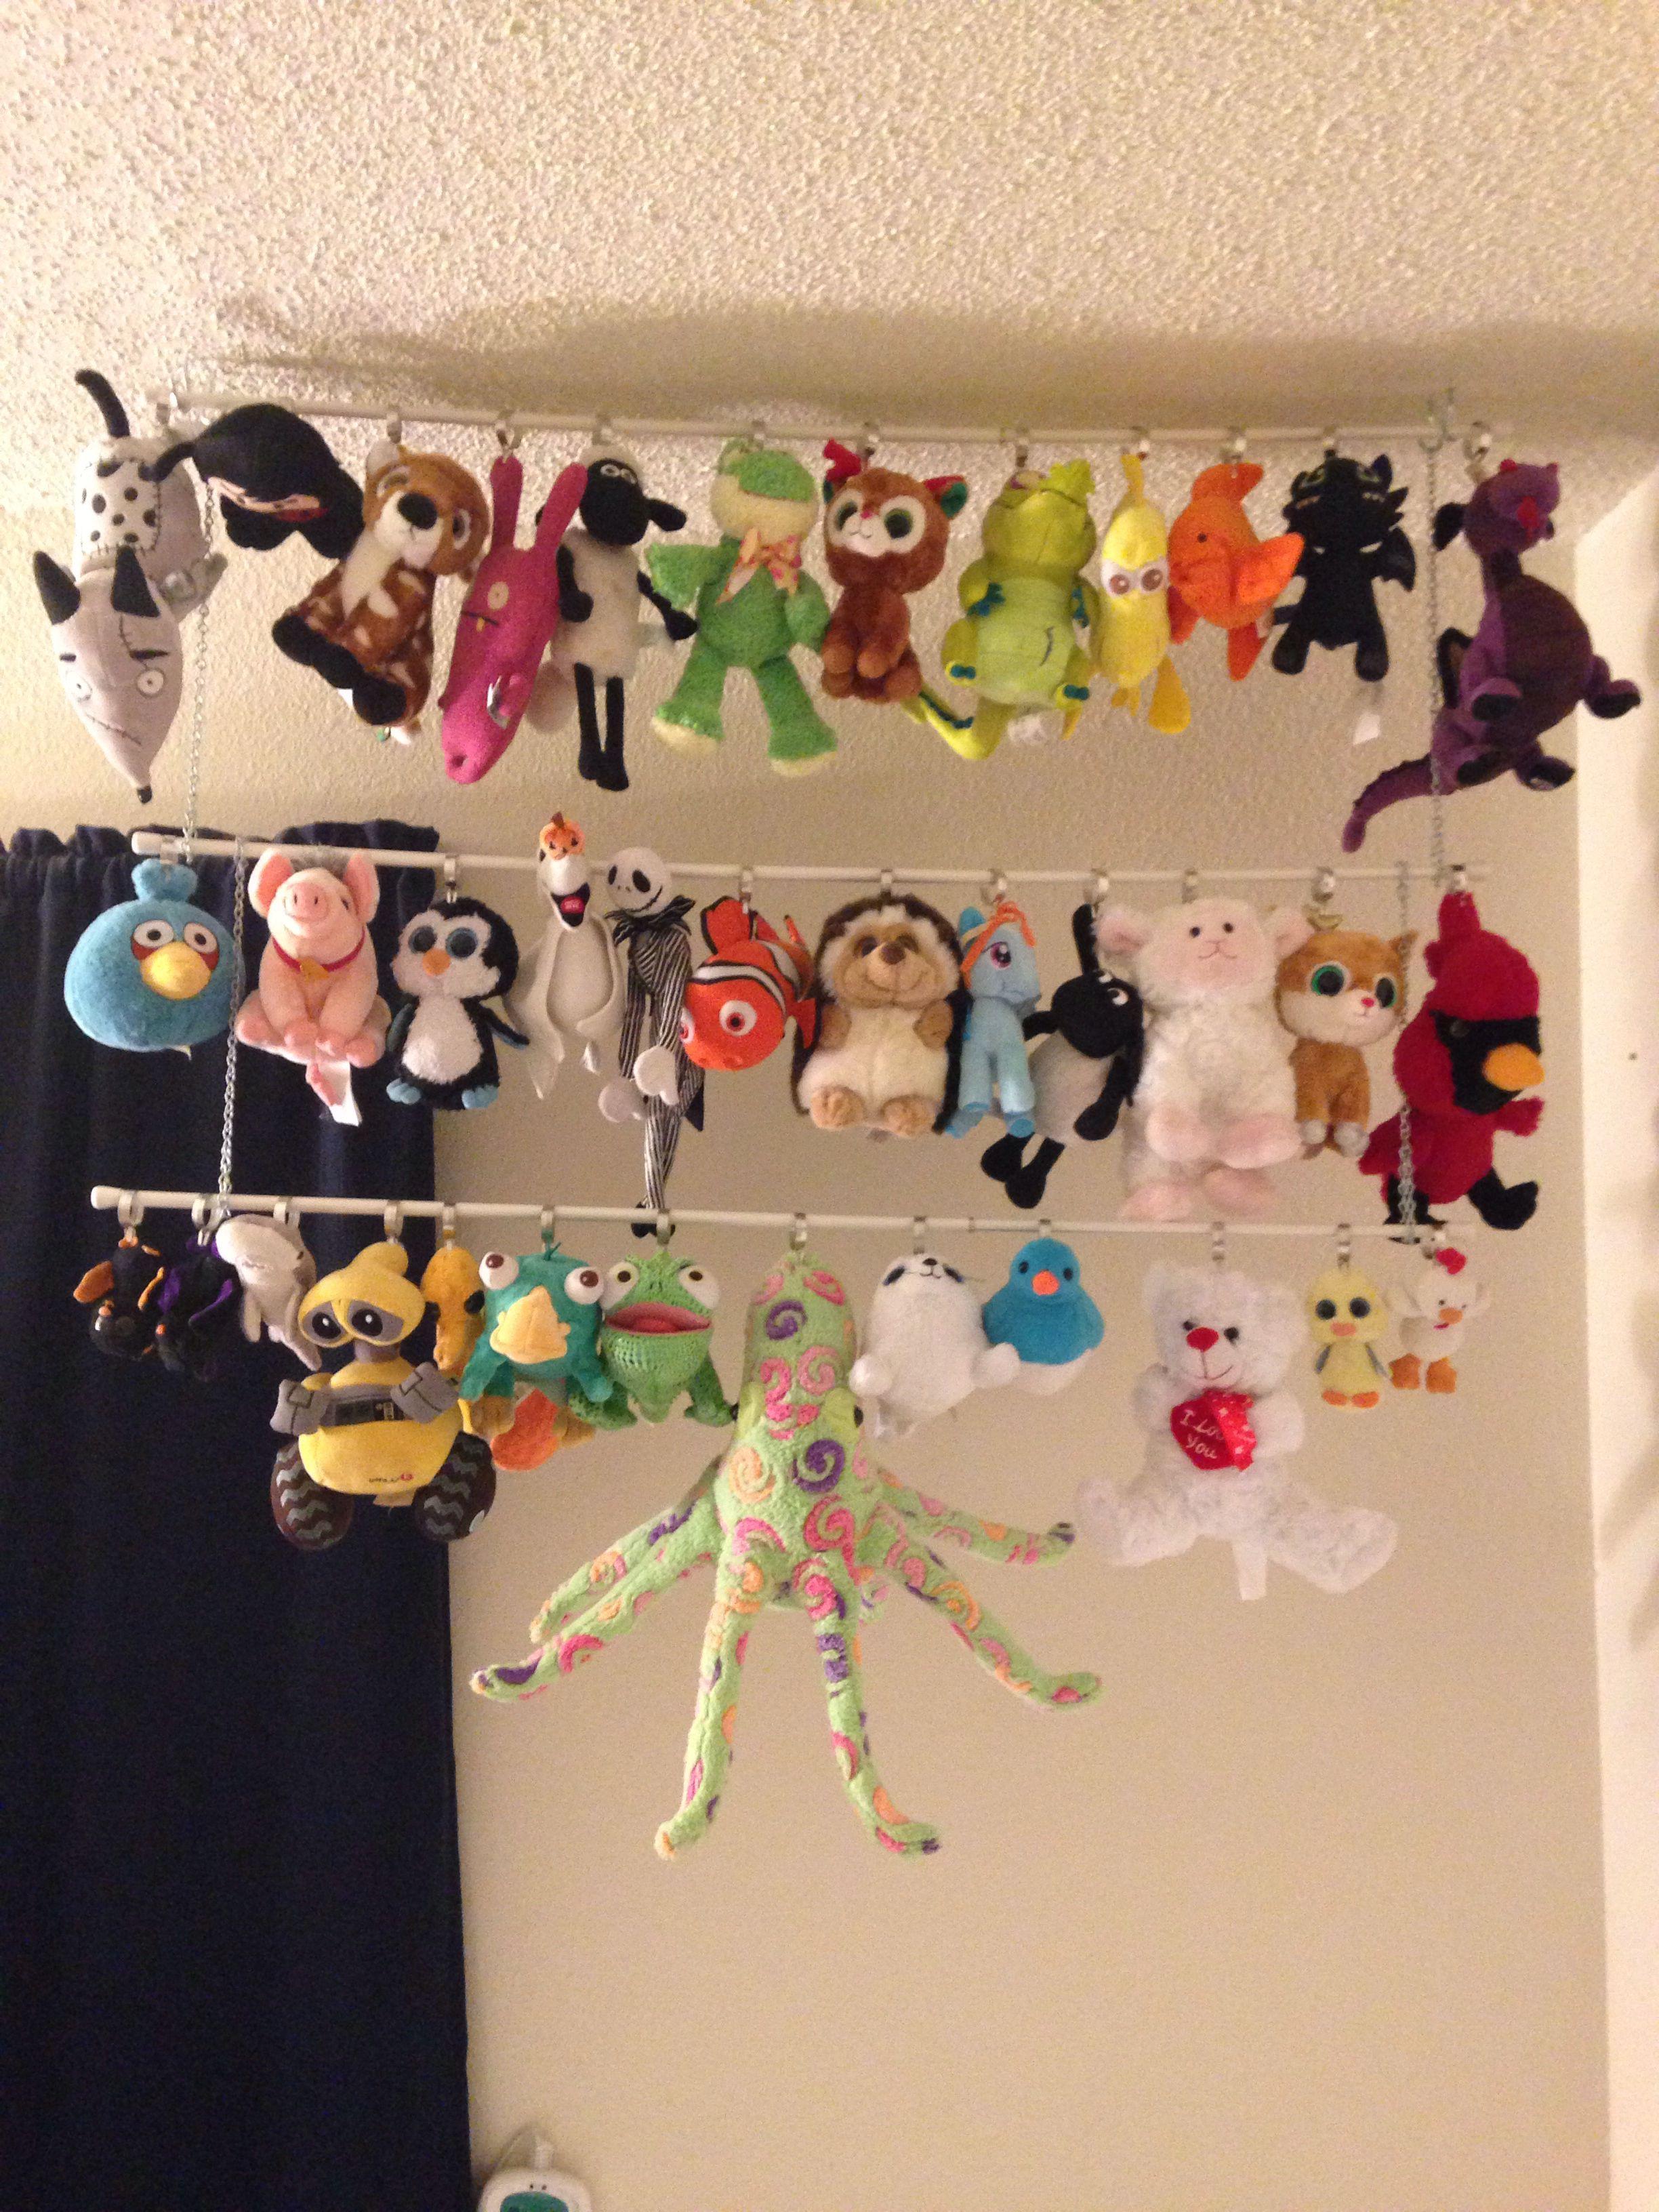 Stuffed Animal Wall Display Stuffed Animal Displays Wall